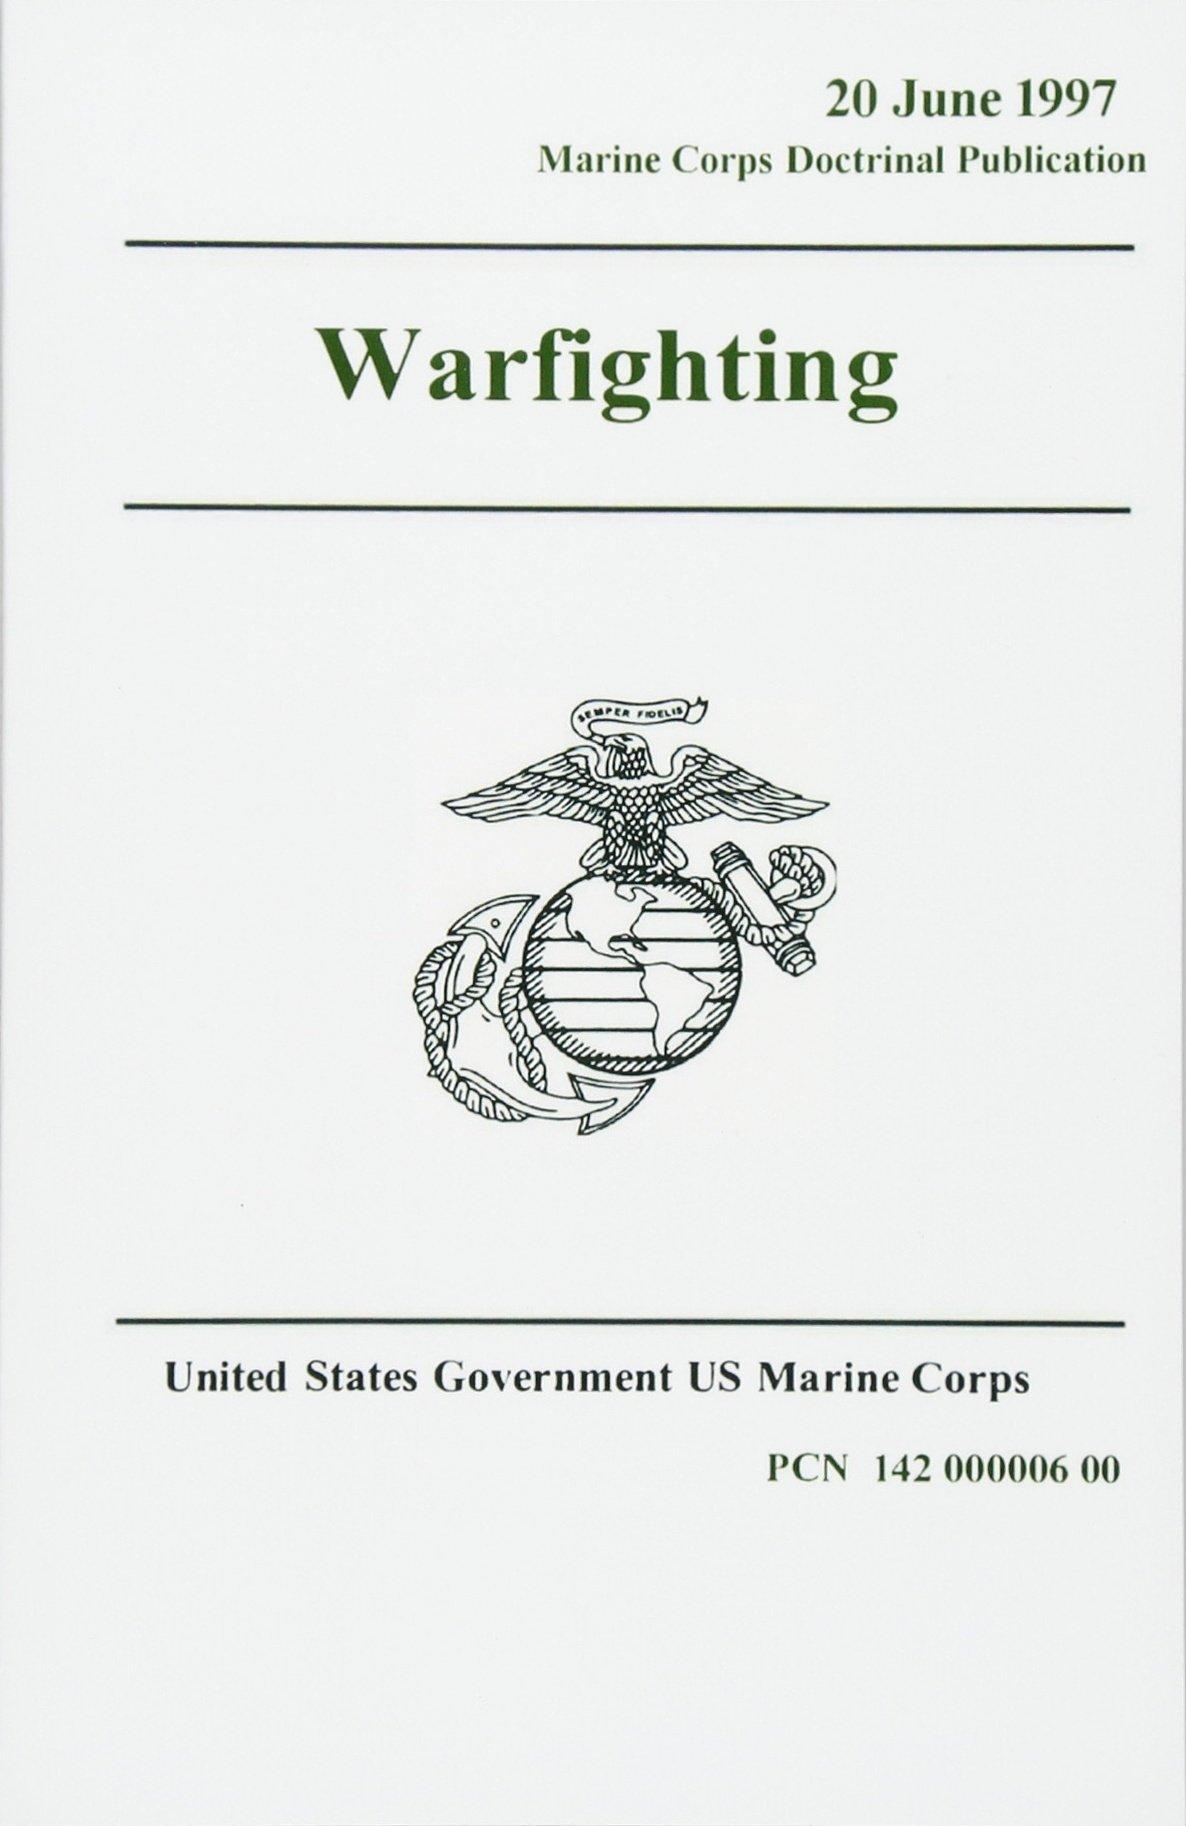 mcdp 1 warfighting